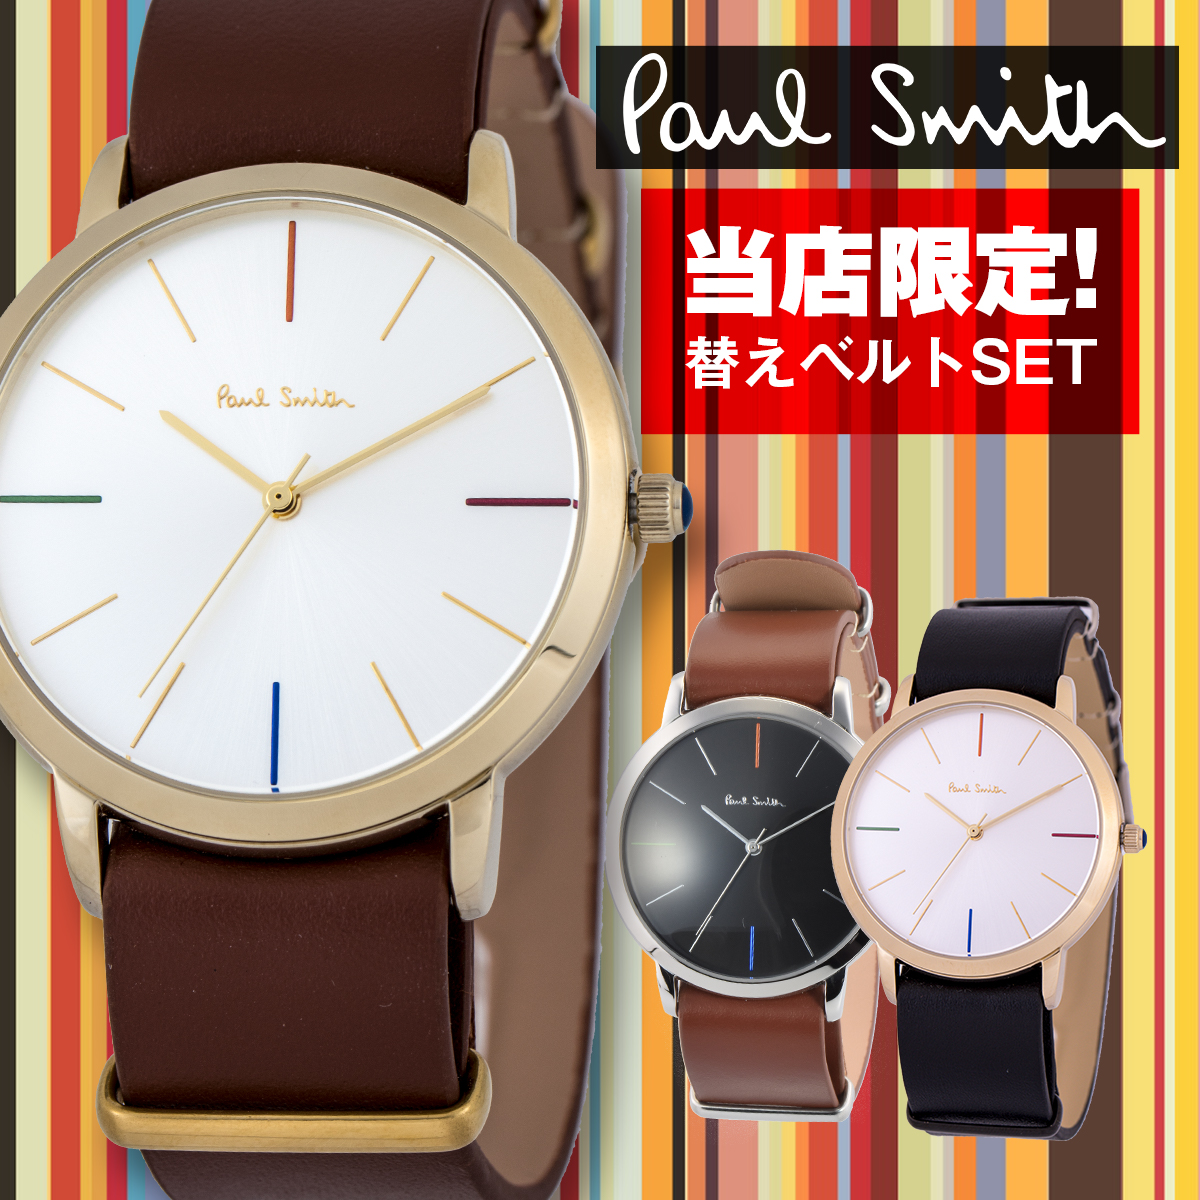 PAUL SMITH ポールスミス 替えベルト付き時計 P10092 p10054-bk p10053-wh p10055-brsv p10059-brgd 時計 腕時計 ユニセックス ウォッチ プレゼント 贈り物 記念日 ギフト